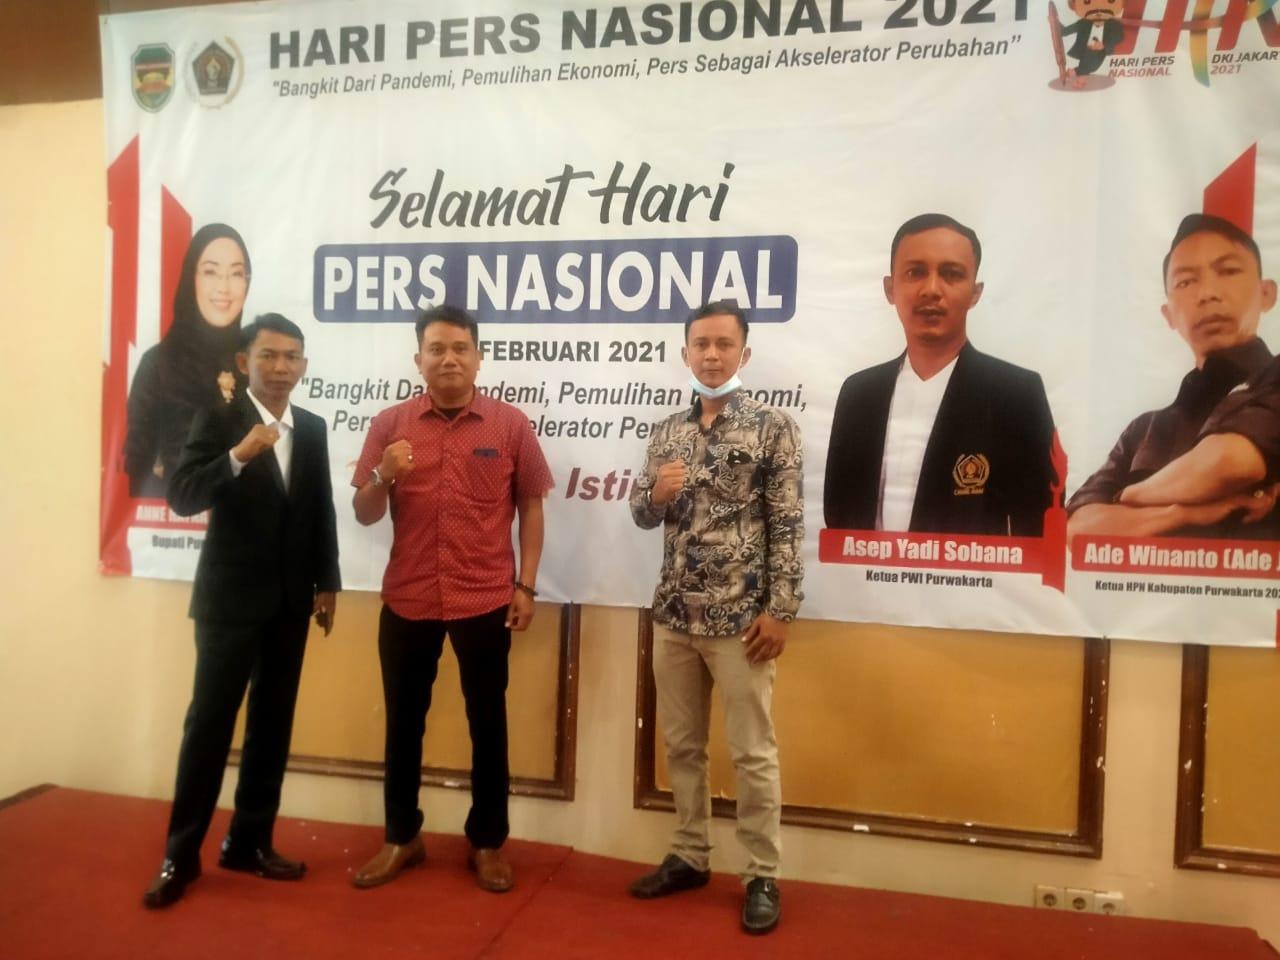 Ketua IWO Kabupaten Purwakarta Apresiasi Atas Terselenggaranya Acara HPN 2021